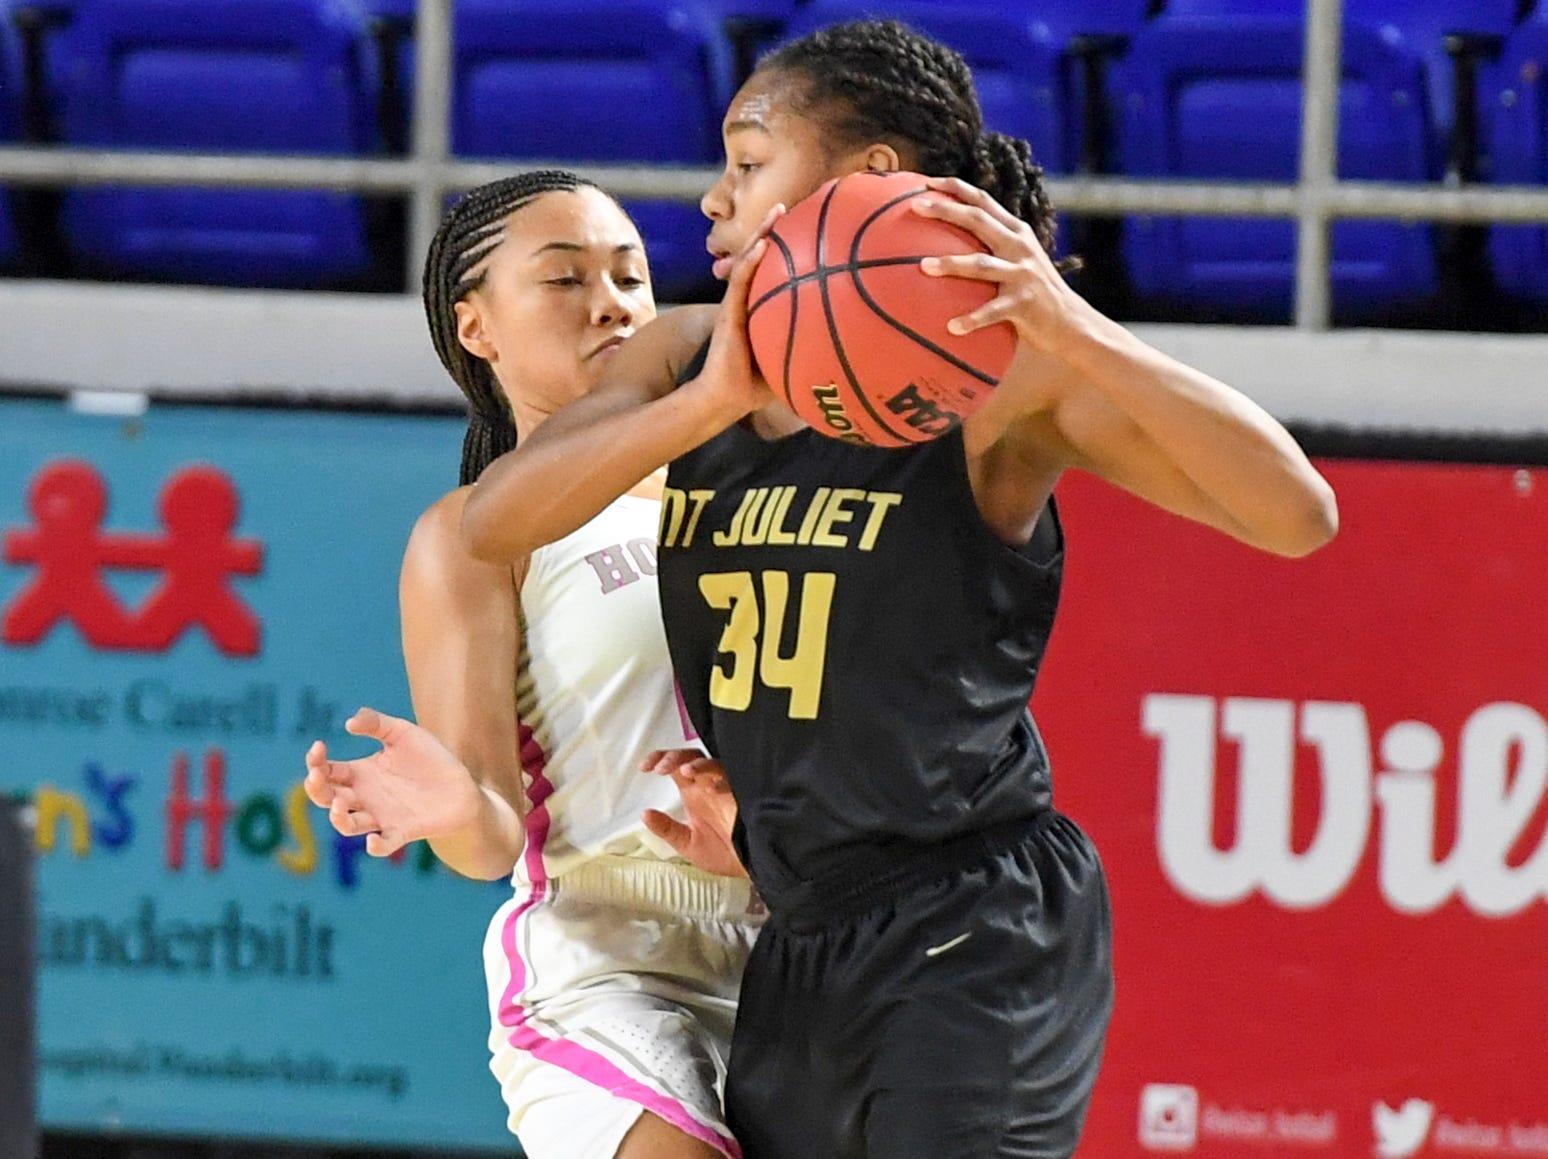 Houston's Madison Griggs (23) guards Mt. Juliet's Tondriannha Davis (34) during their Class AAA quarterfianl game, Wednesday, March 6, 2019, in Murfreesboro.